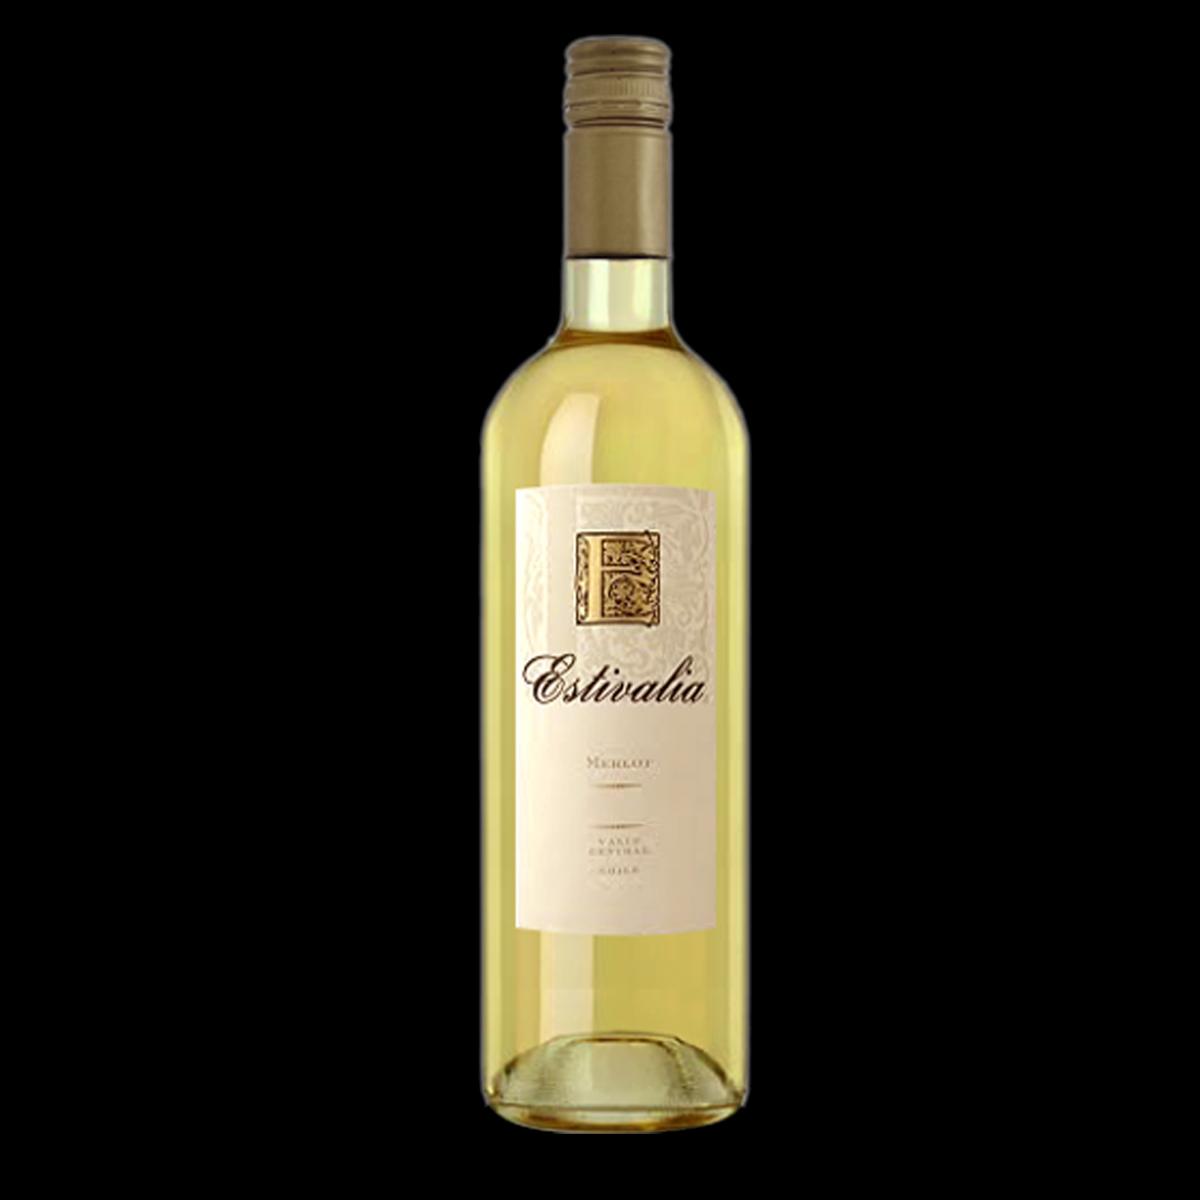 Siegel Estivalia Varietal Cabernet Sauvignon Blanc